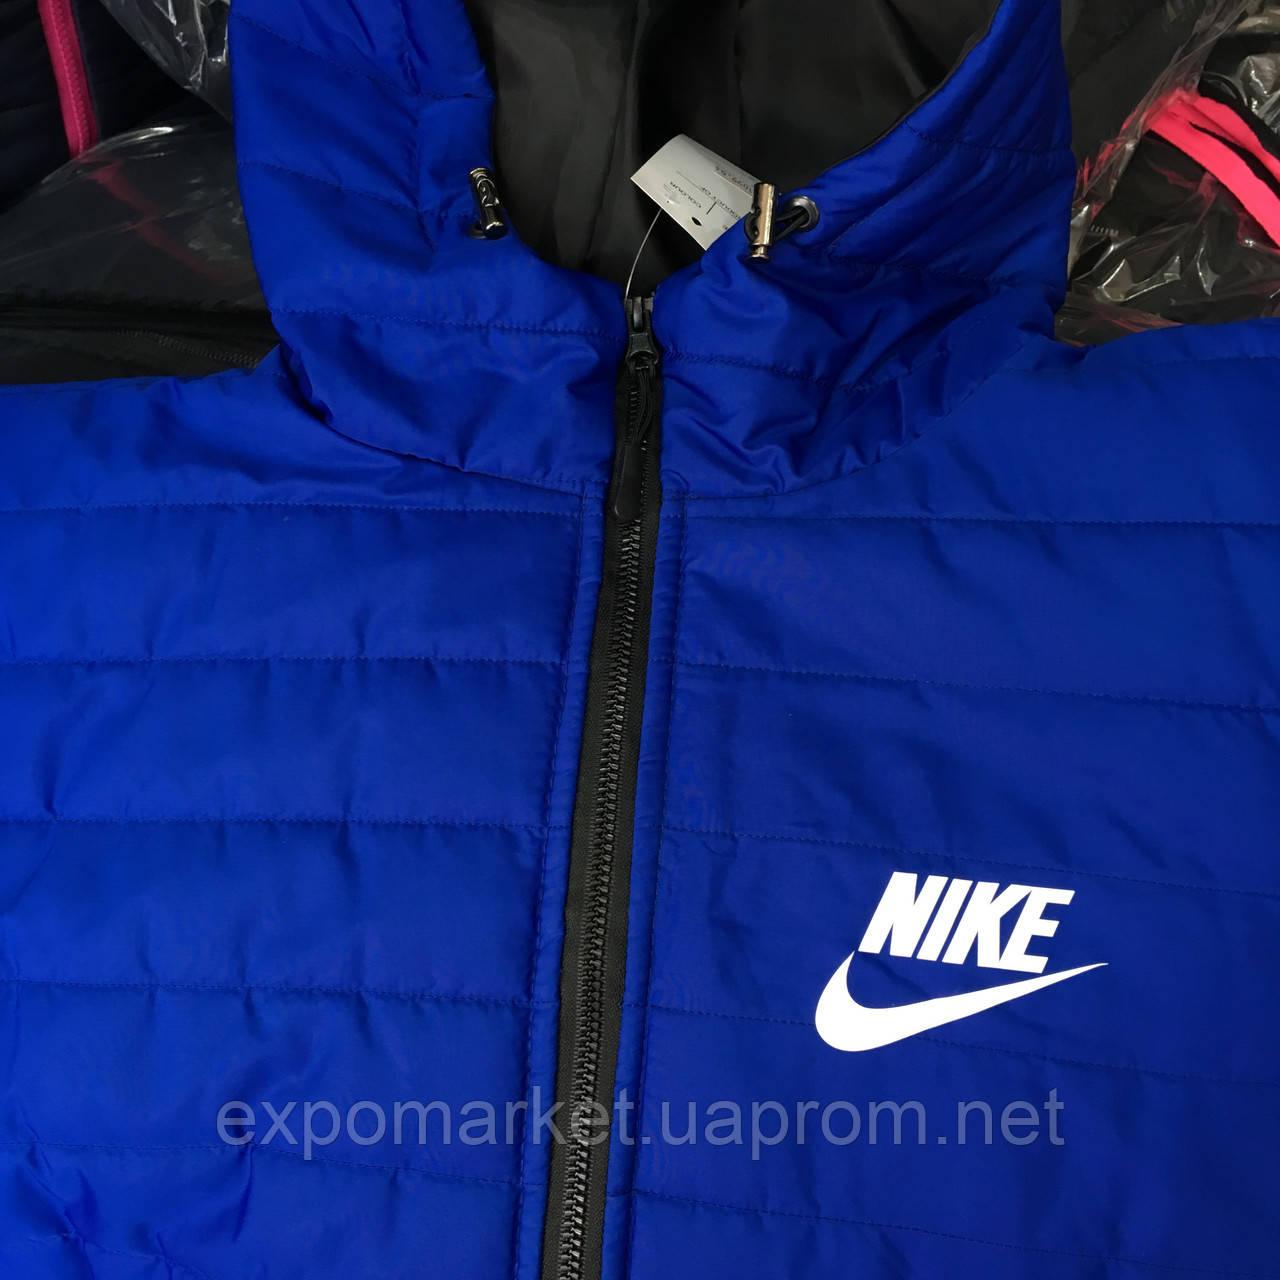 eebd4d5a Мужской зимний спортивный костюм Nike утепленный: продажа, цена в ...